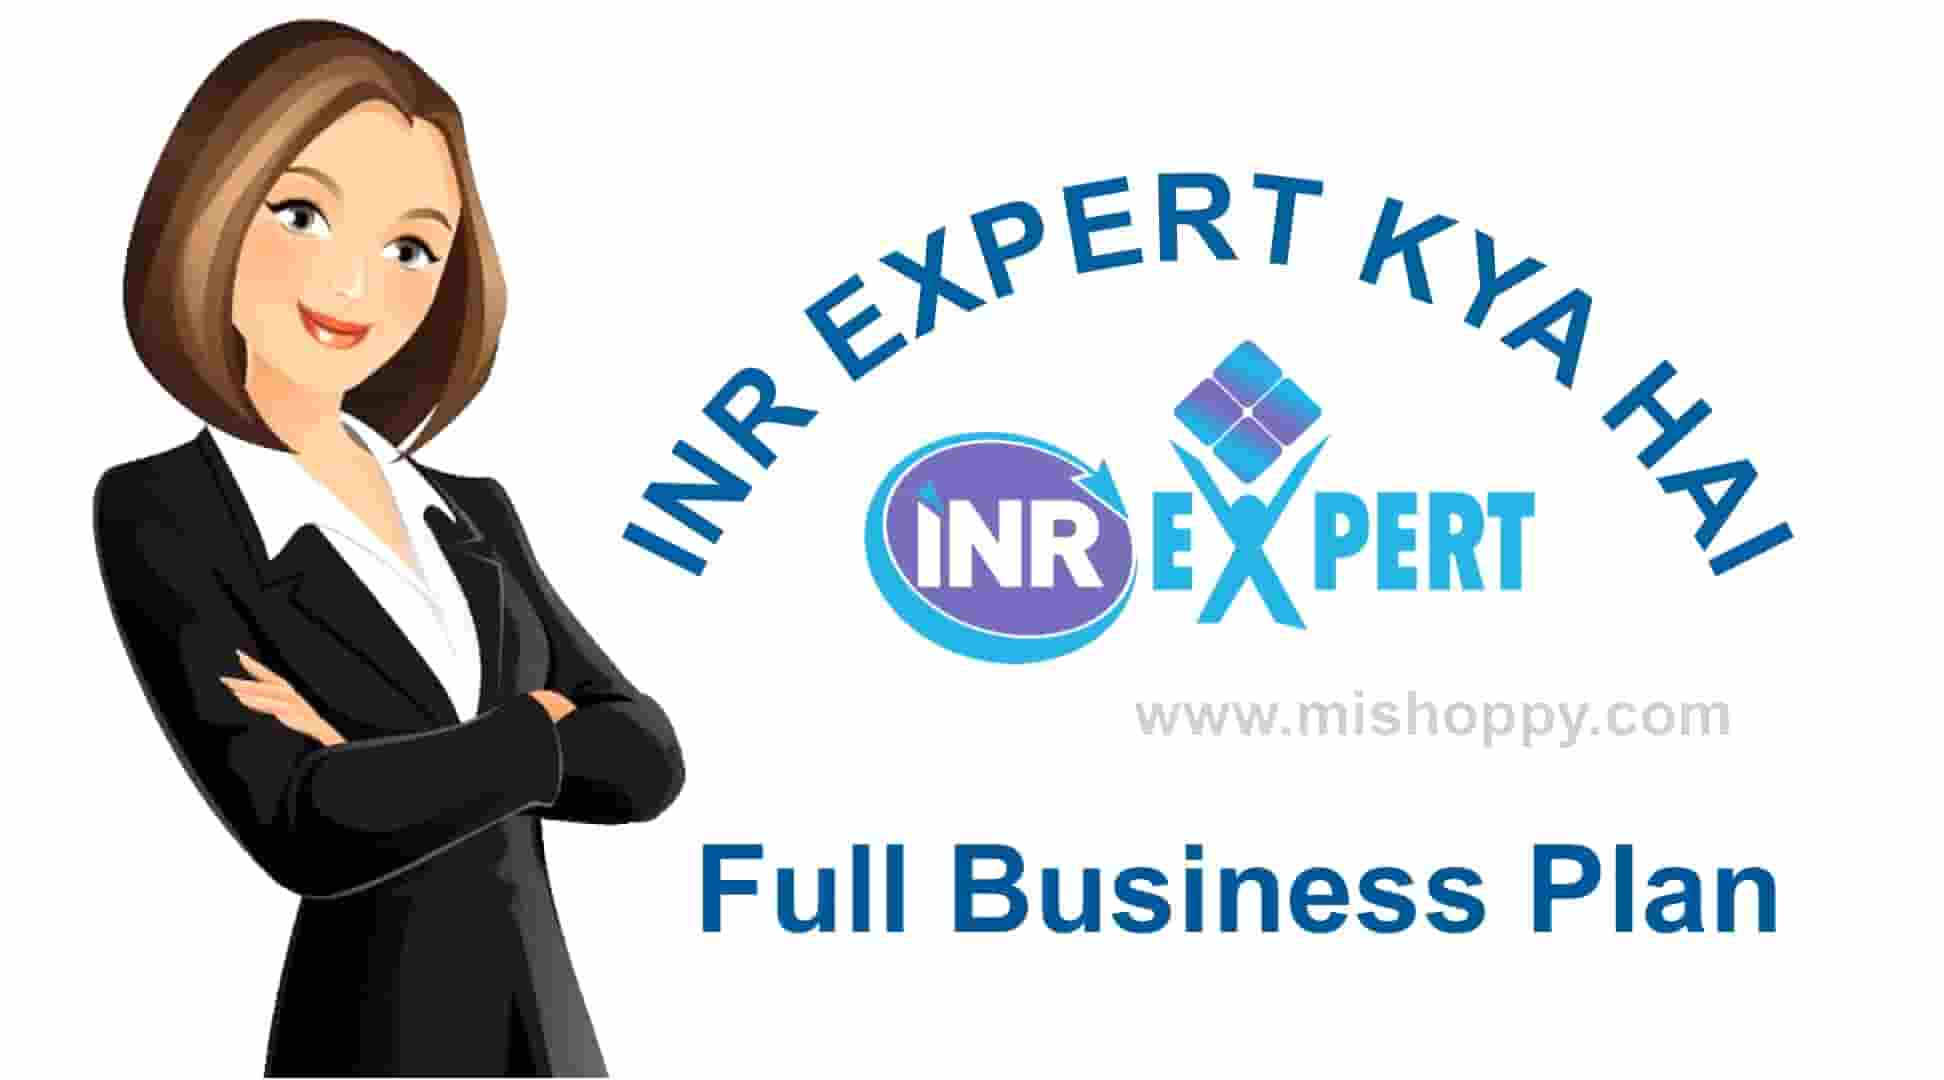 INR Expert Kya Hai - Business Plan